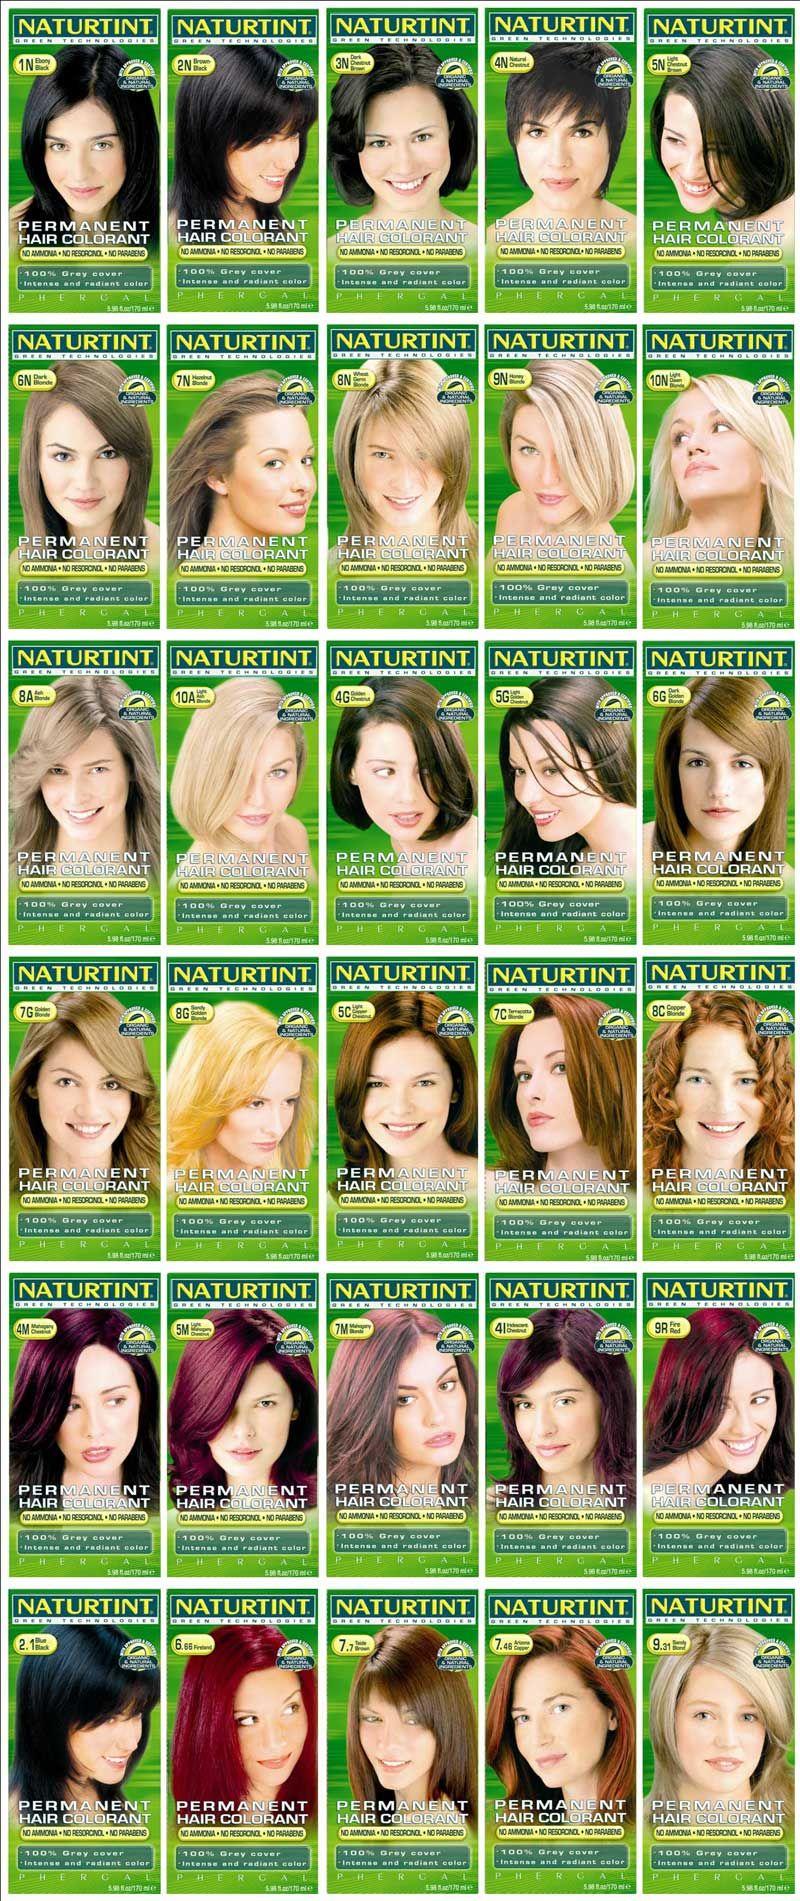 Naturtint permanent hair colourant colour chart plant based